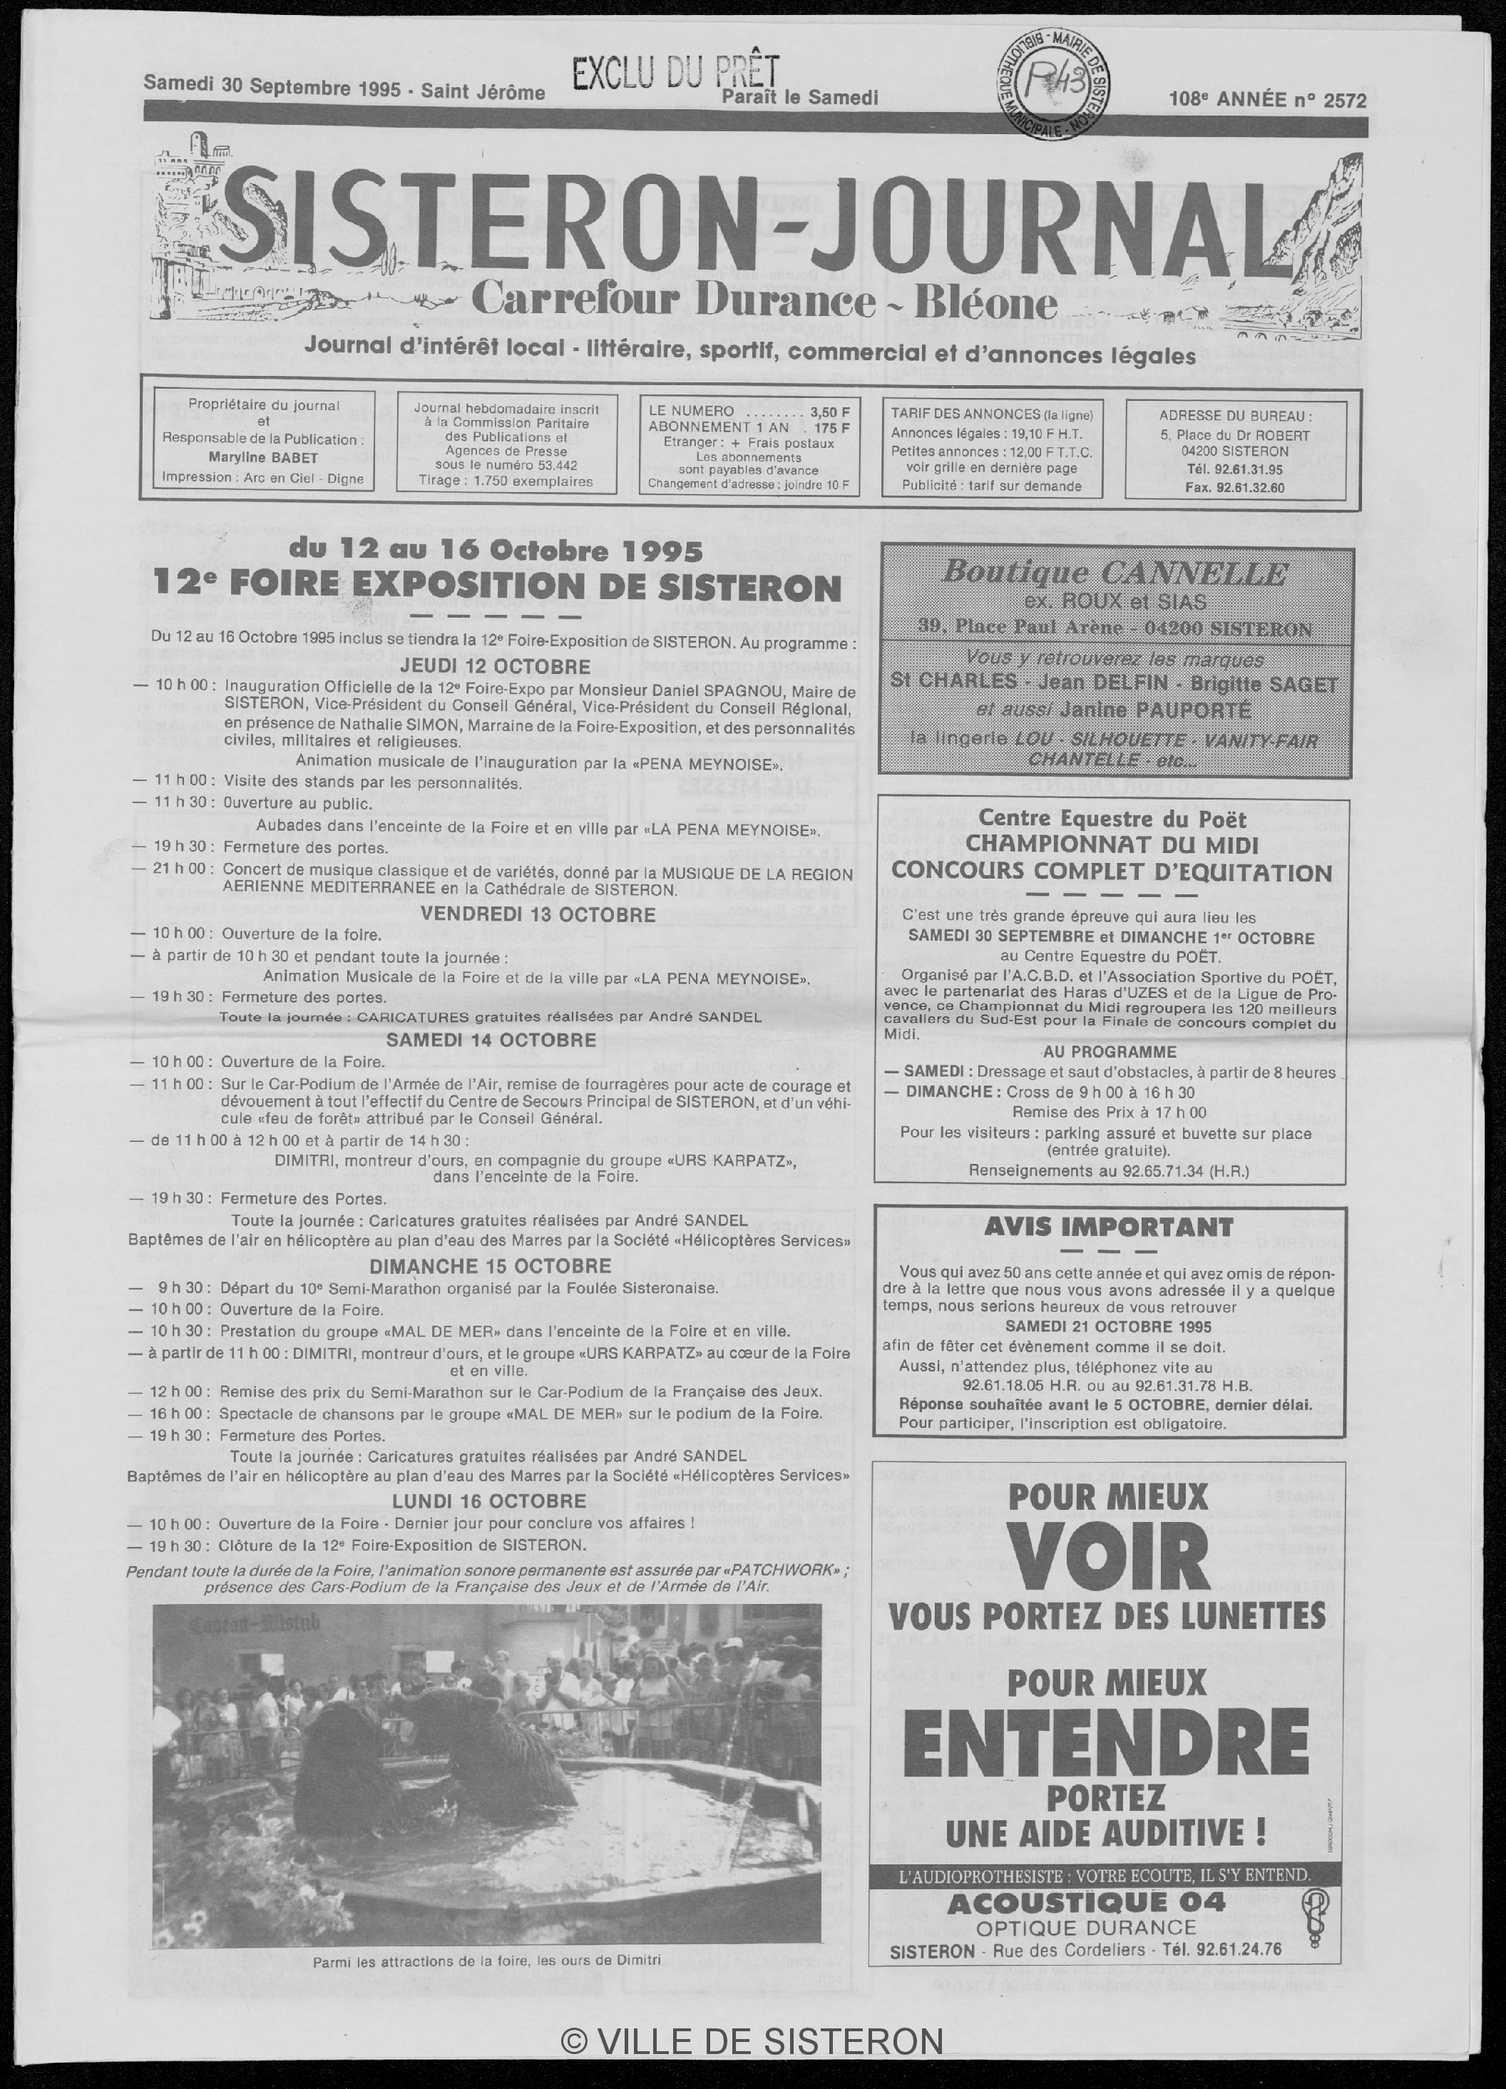 Calaméo Le Sisteron Journal Du 30091995